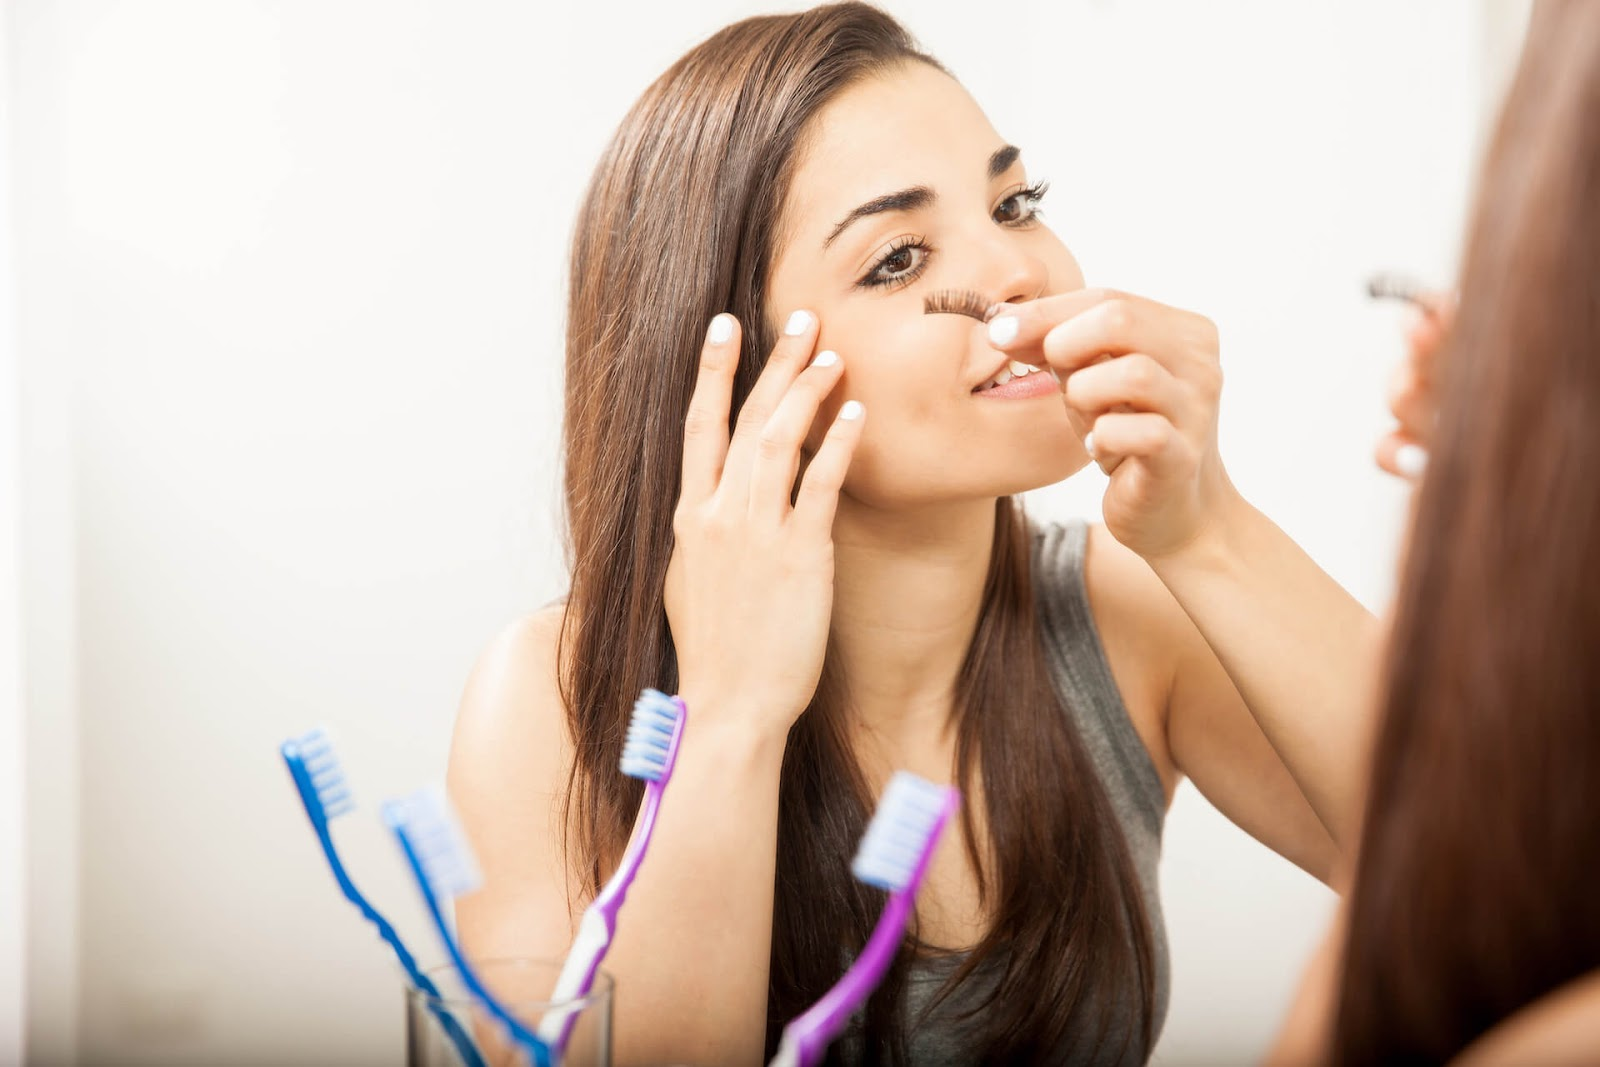 Lady applying some fake eyelashes with her fingers